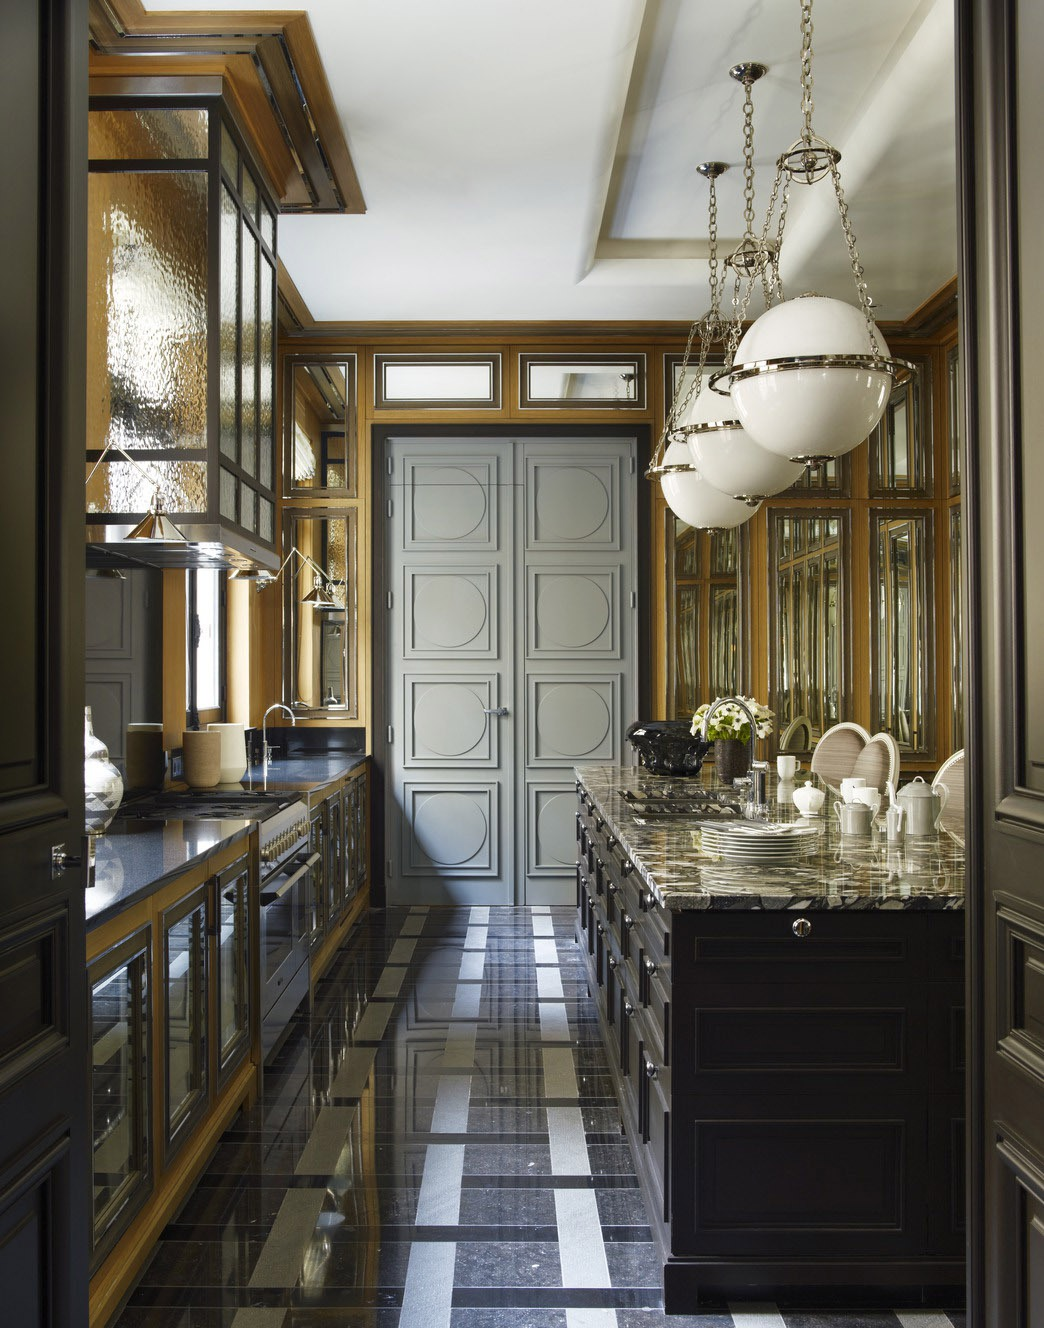 best lighting for kitchen ninja 1500 watt mega system 41 ideas  wow decor